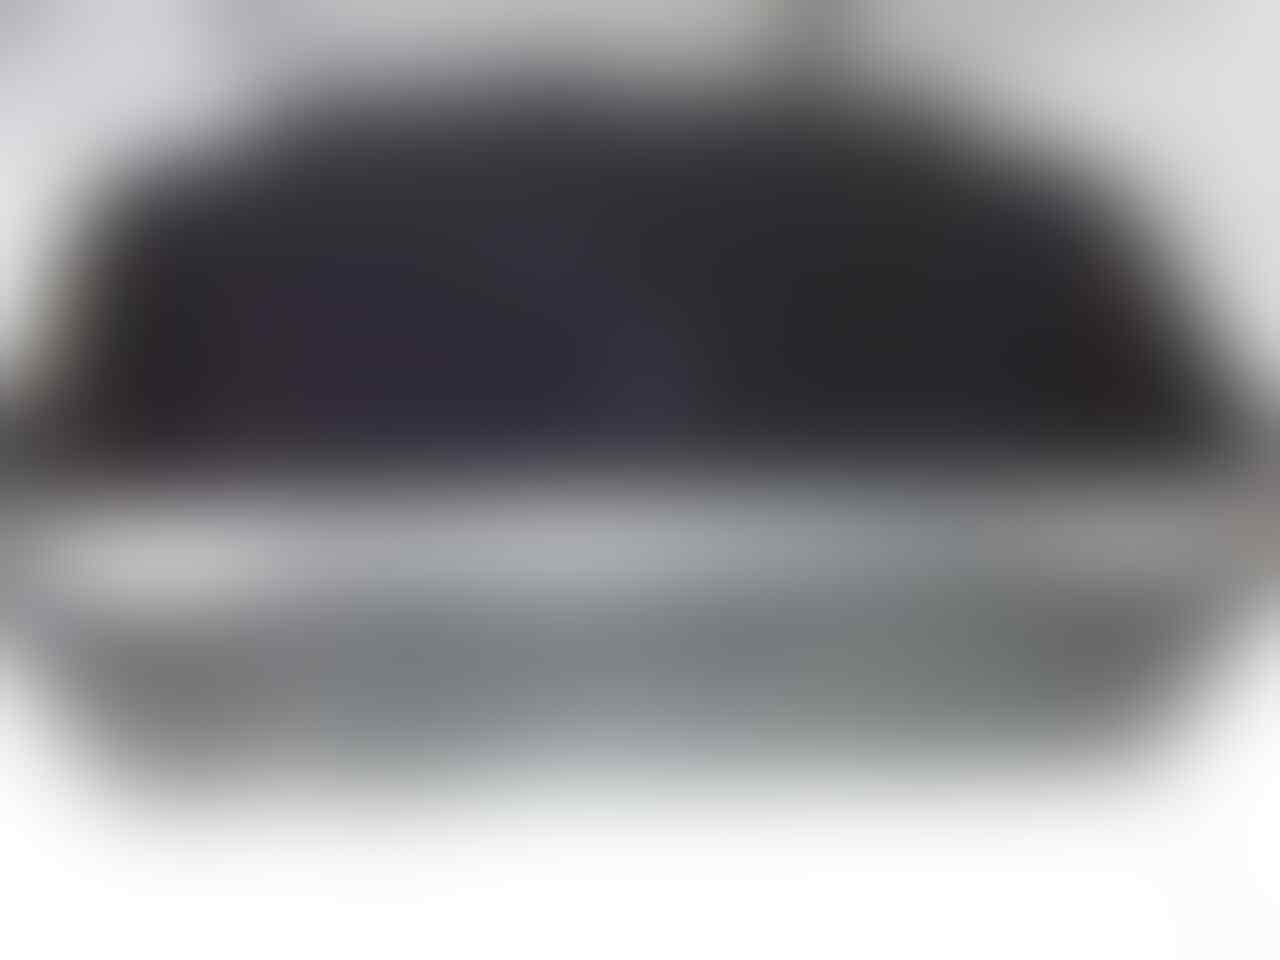 SALE PRINTER CANON IP 3680 second bandung